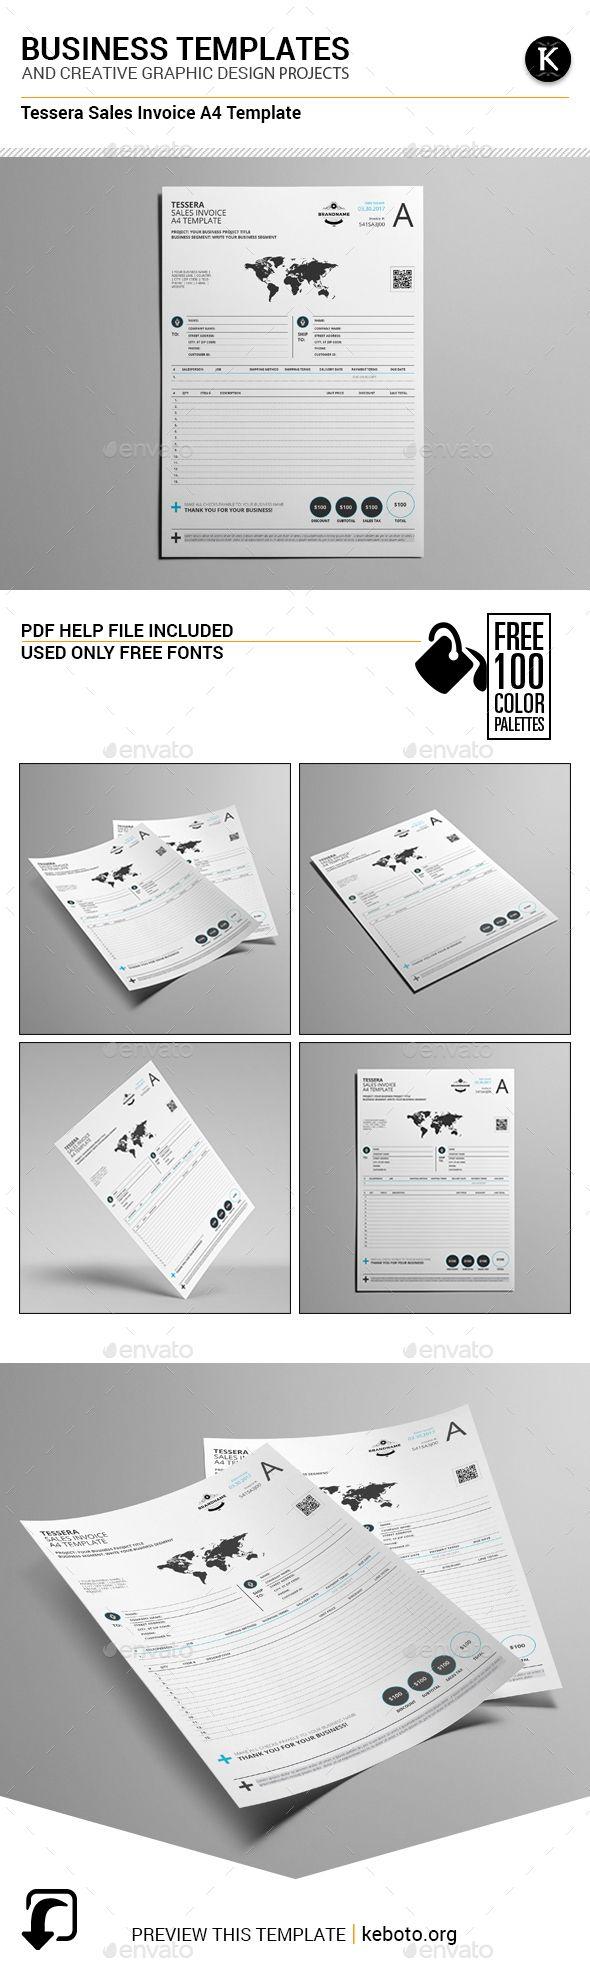 Tessera Sales Invoice A4 Template Templates Letter Templates Print Templates